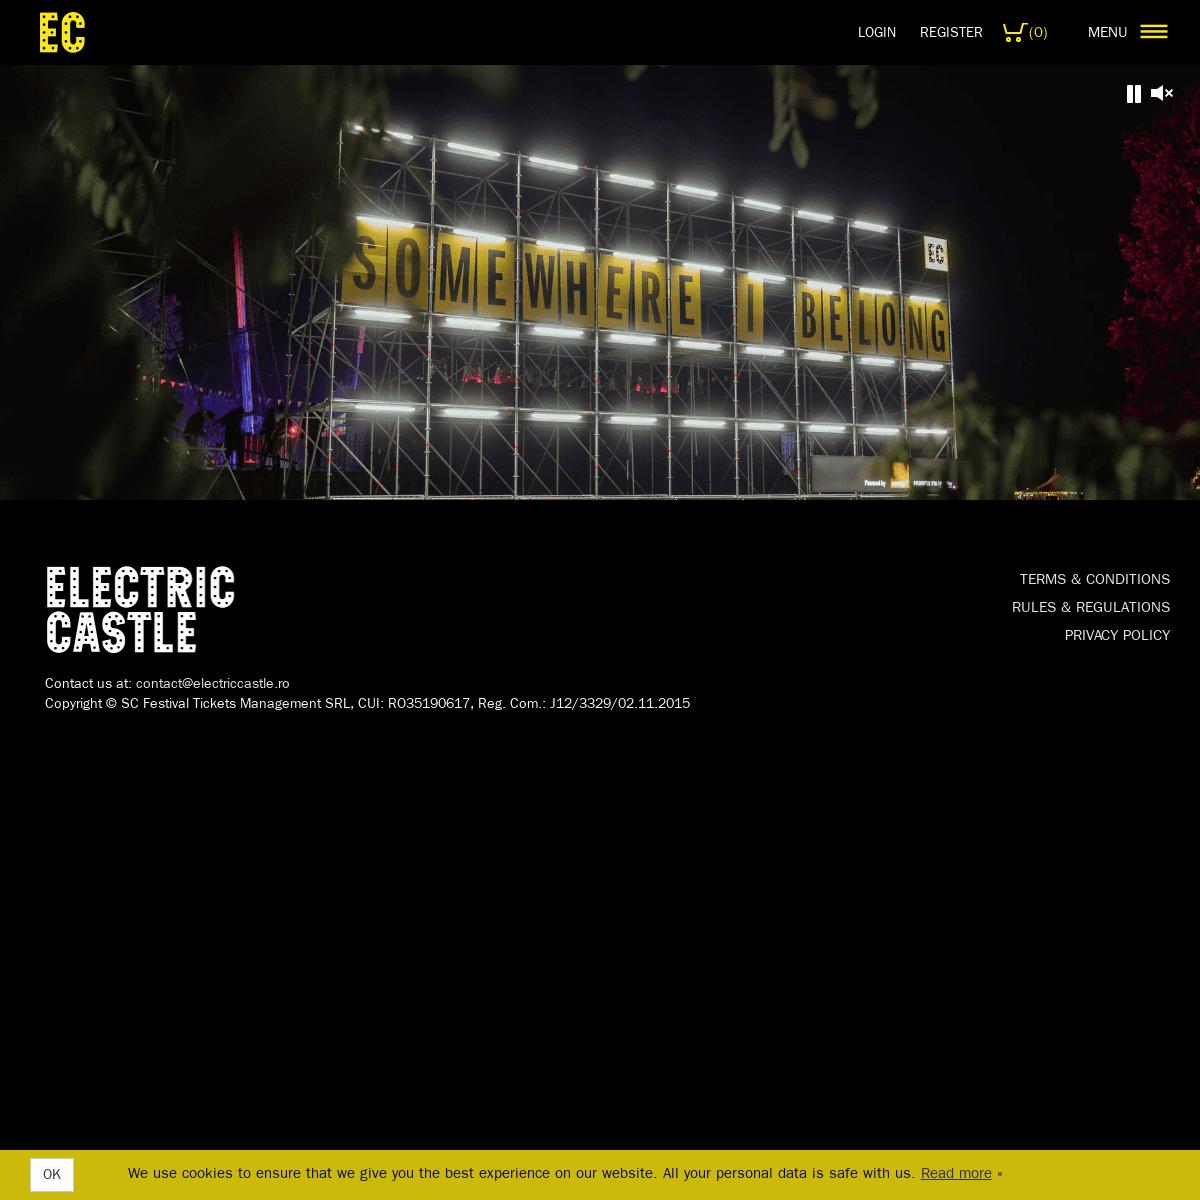 Electric Castle - July 17-21 2019, Banffy Castle, Cluj, Romania